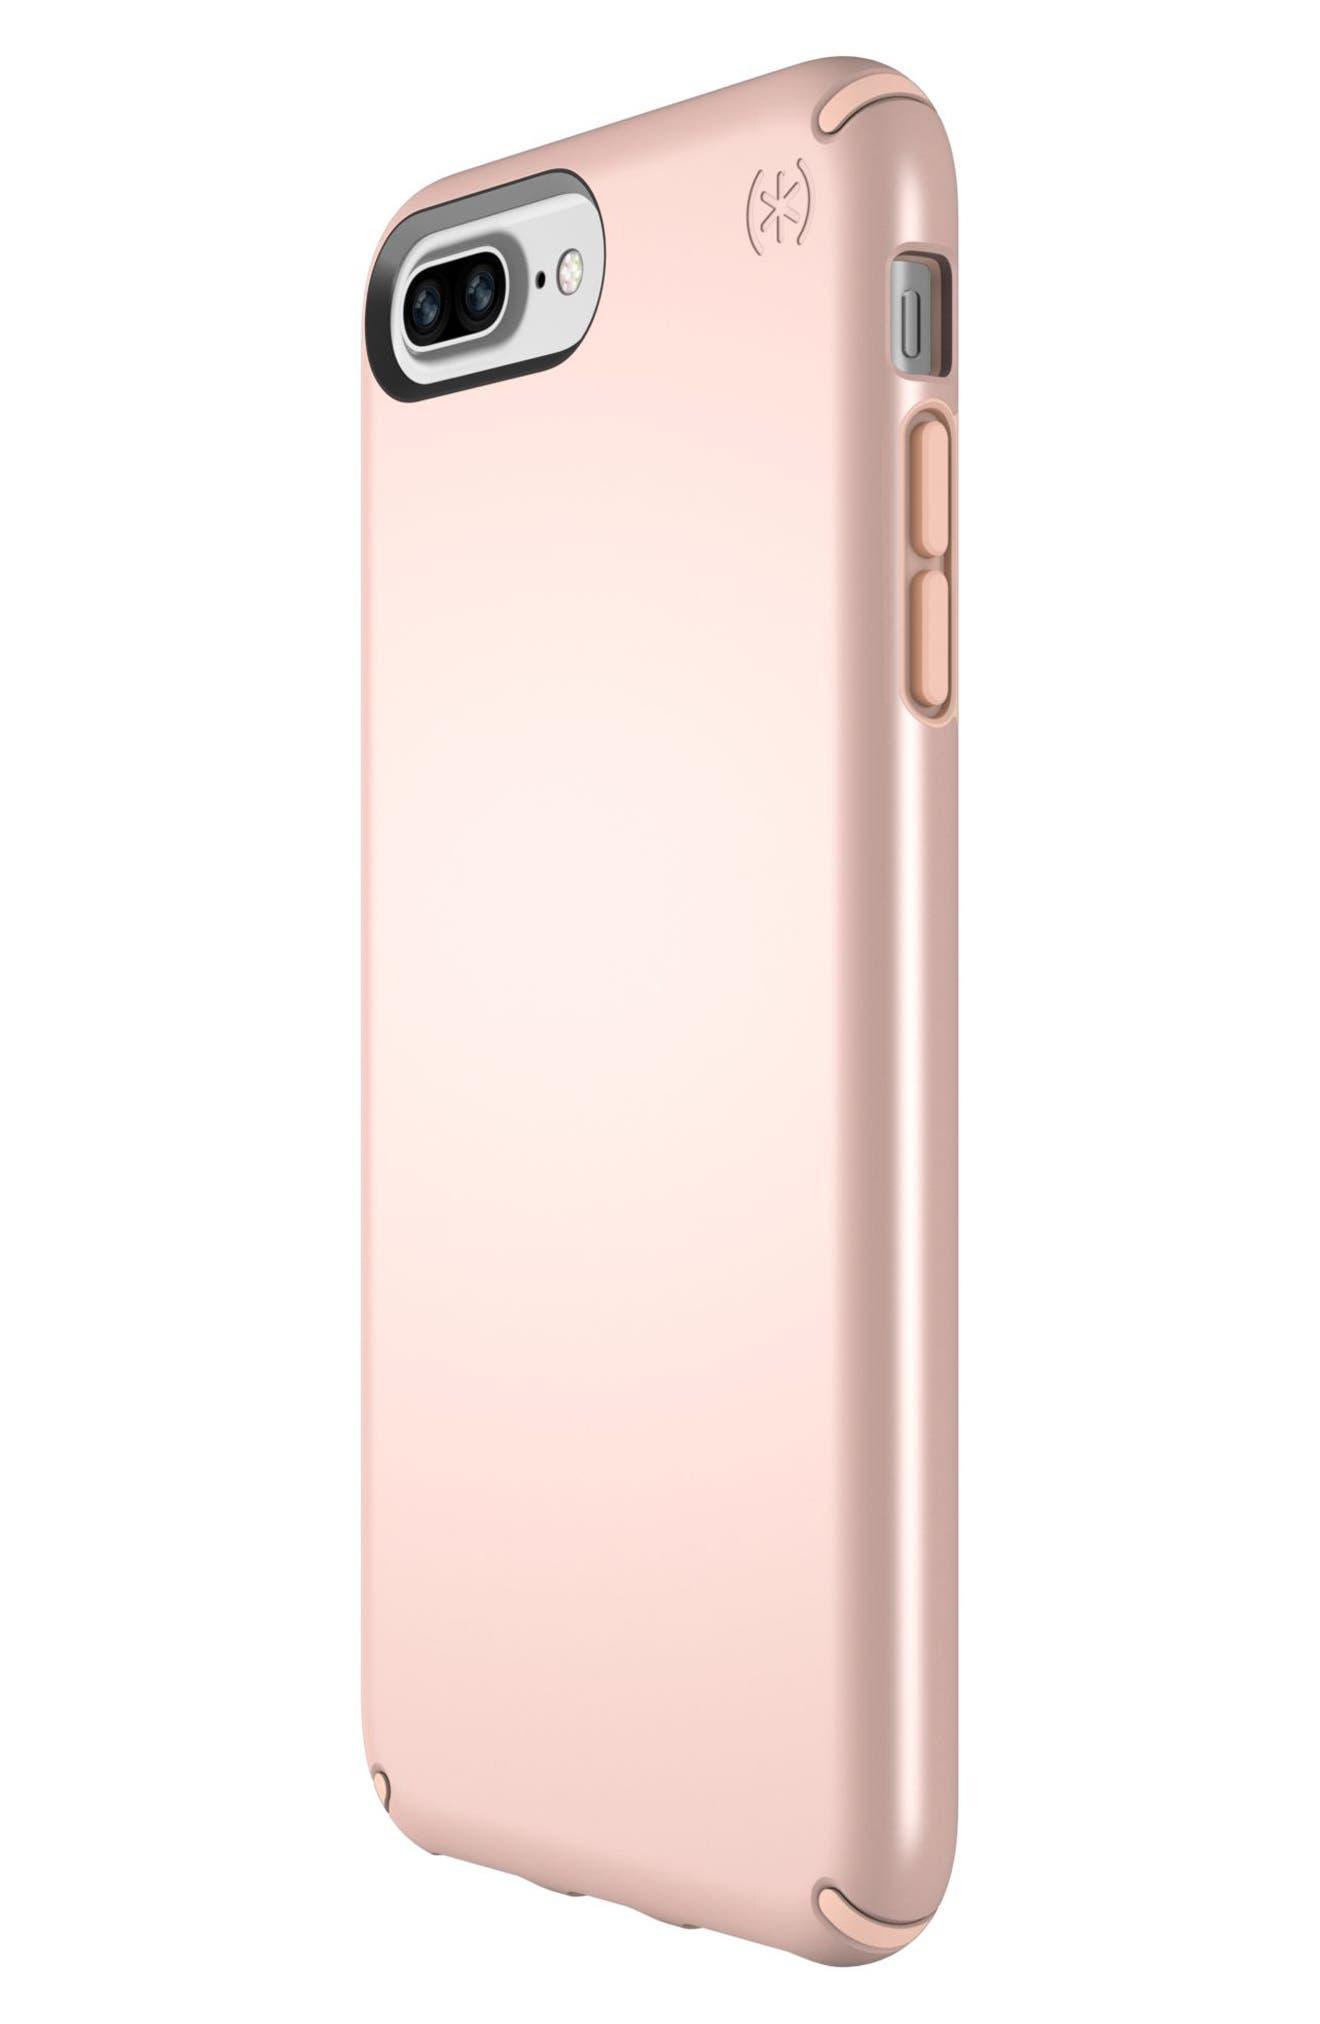 iPhone 6/6s/7/8 Plus Case,                             Alternate thumbnail 5, color,                             Rose Gold Metallic/ Peach